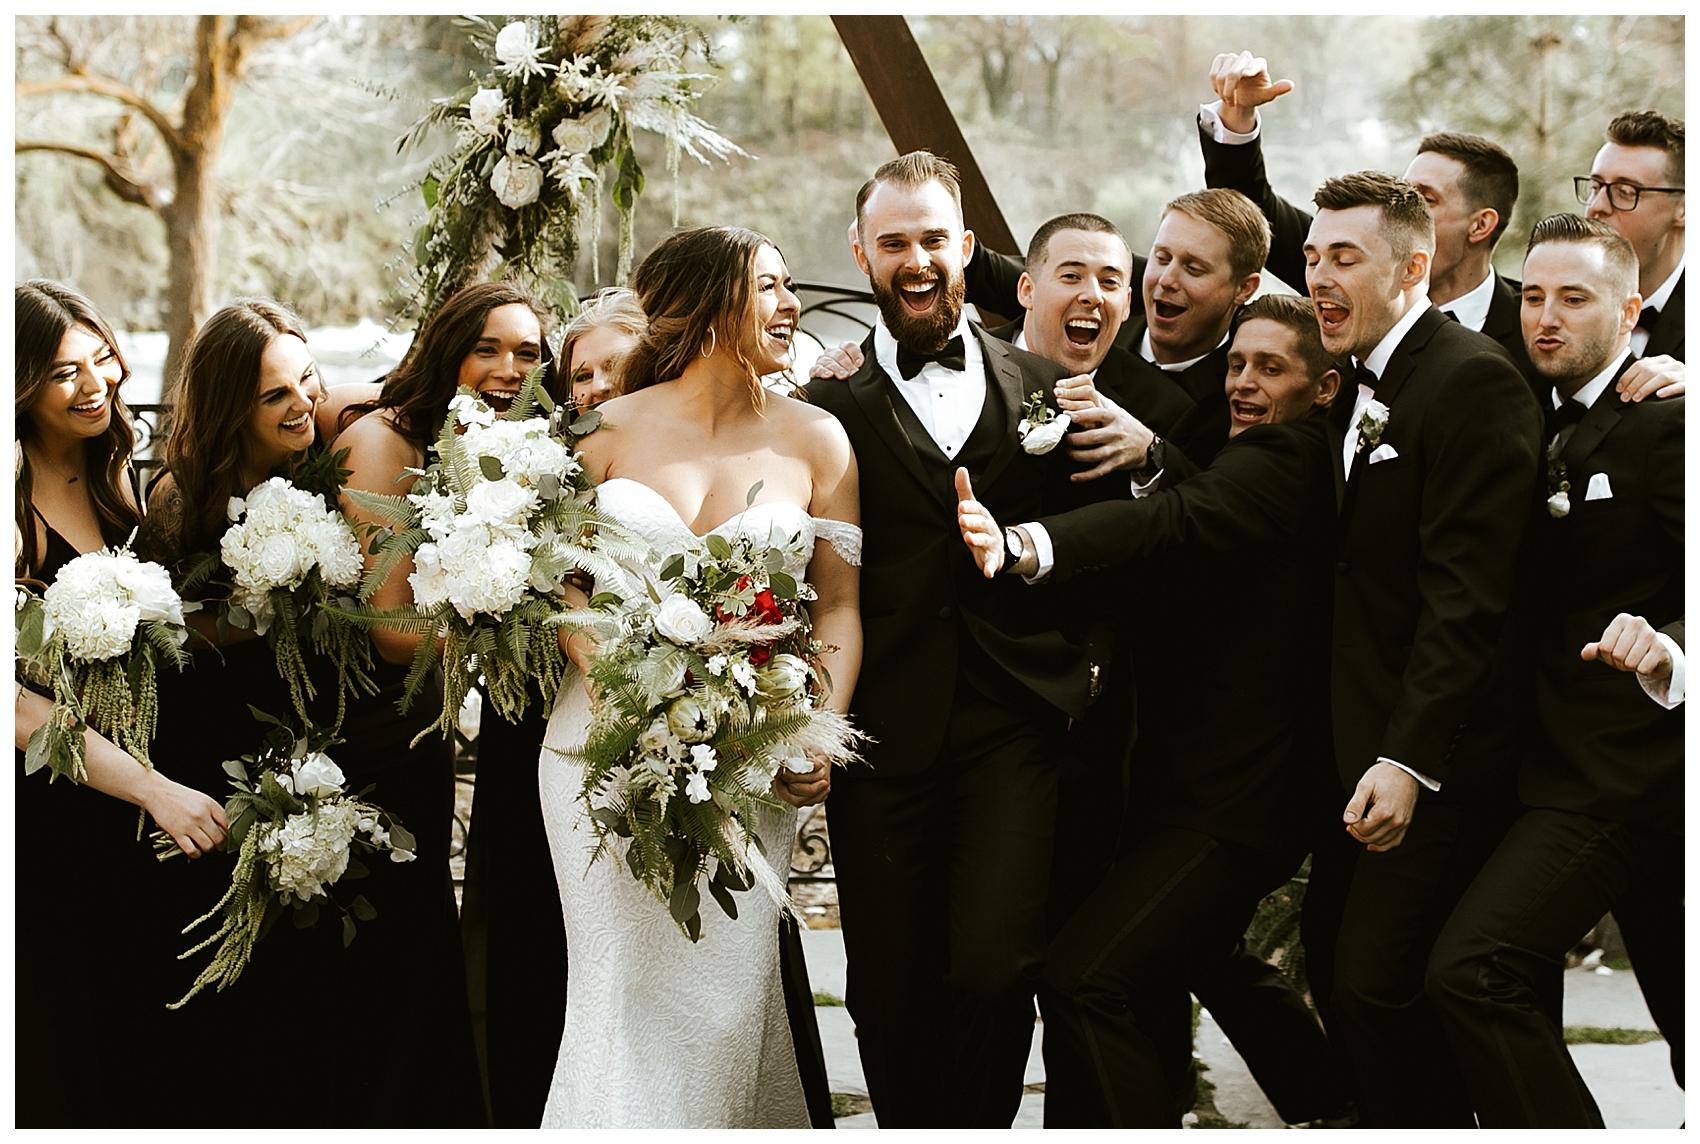 Chateau Rive Spokane Wedding Cassie Trottier Photography01066.jpg